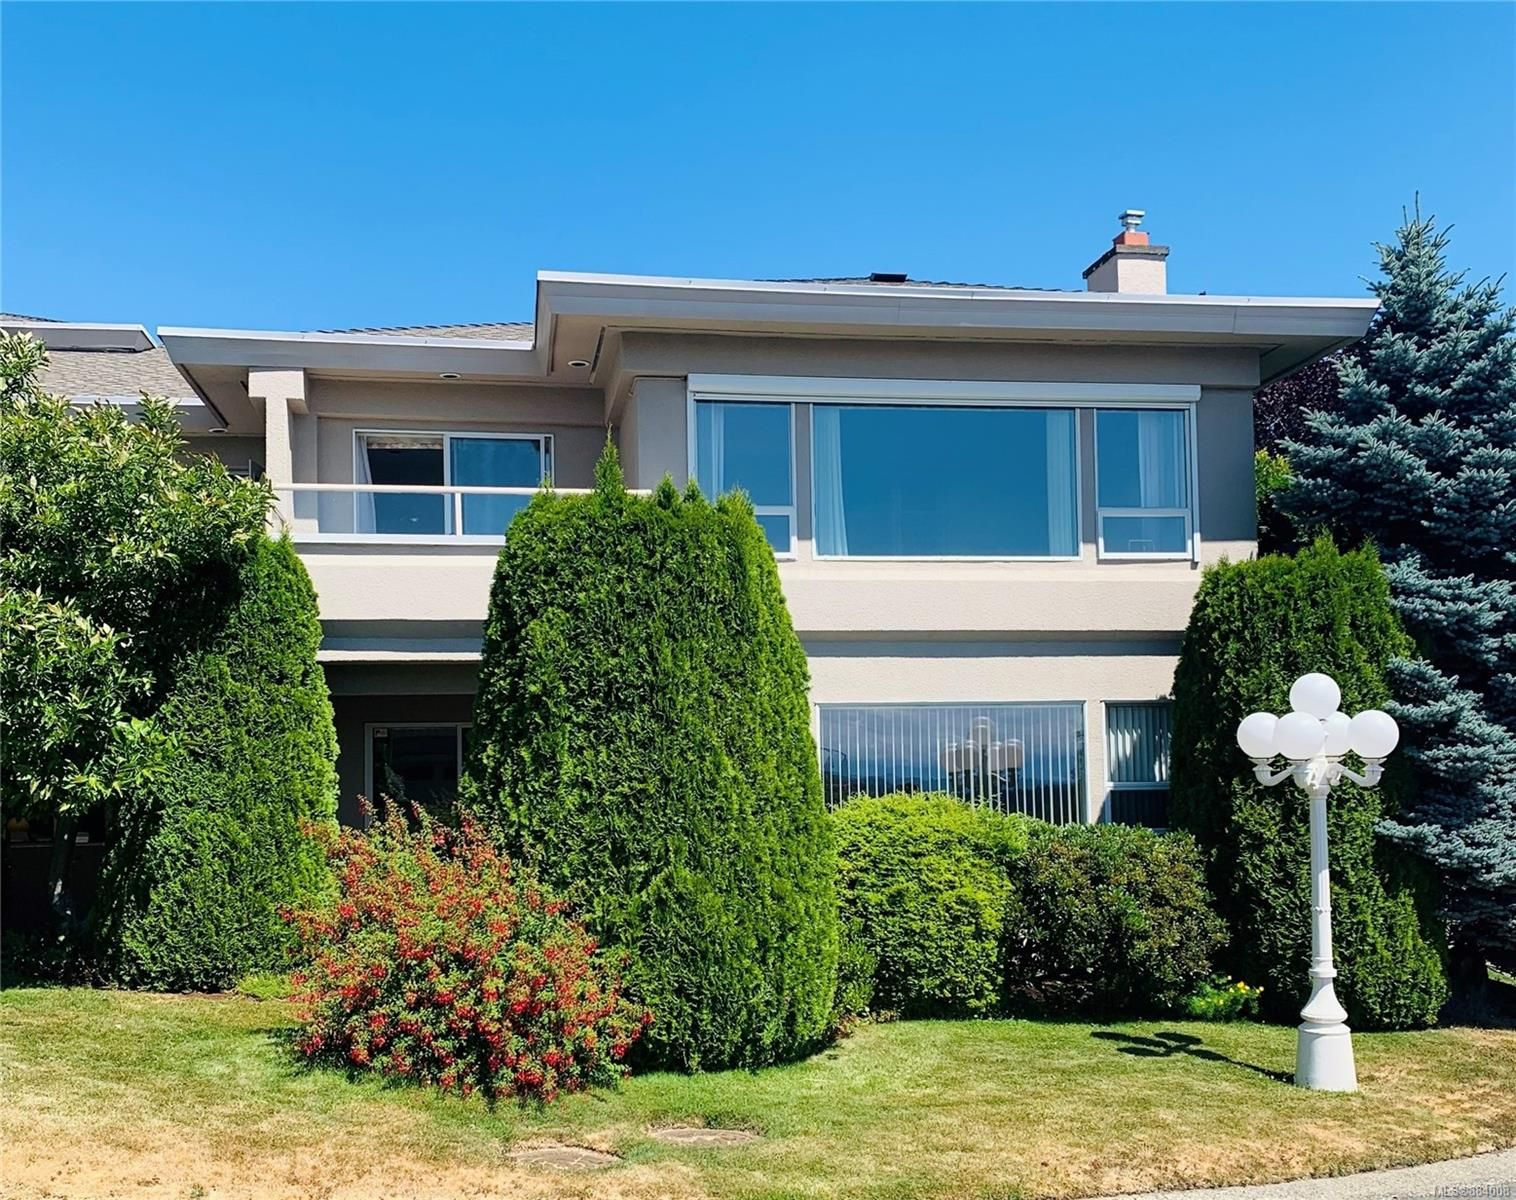 Main Photo: 23 881 Nicholson St in : SE High Quadra Row/Townhouse for sale (Saanich East)  : MLS®# 884008